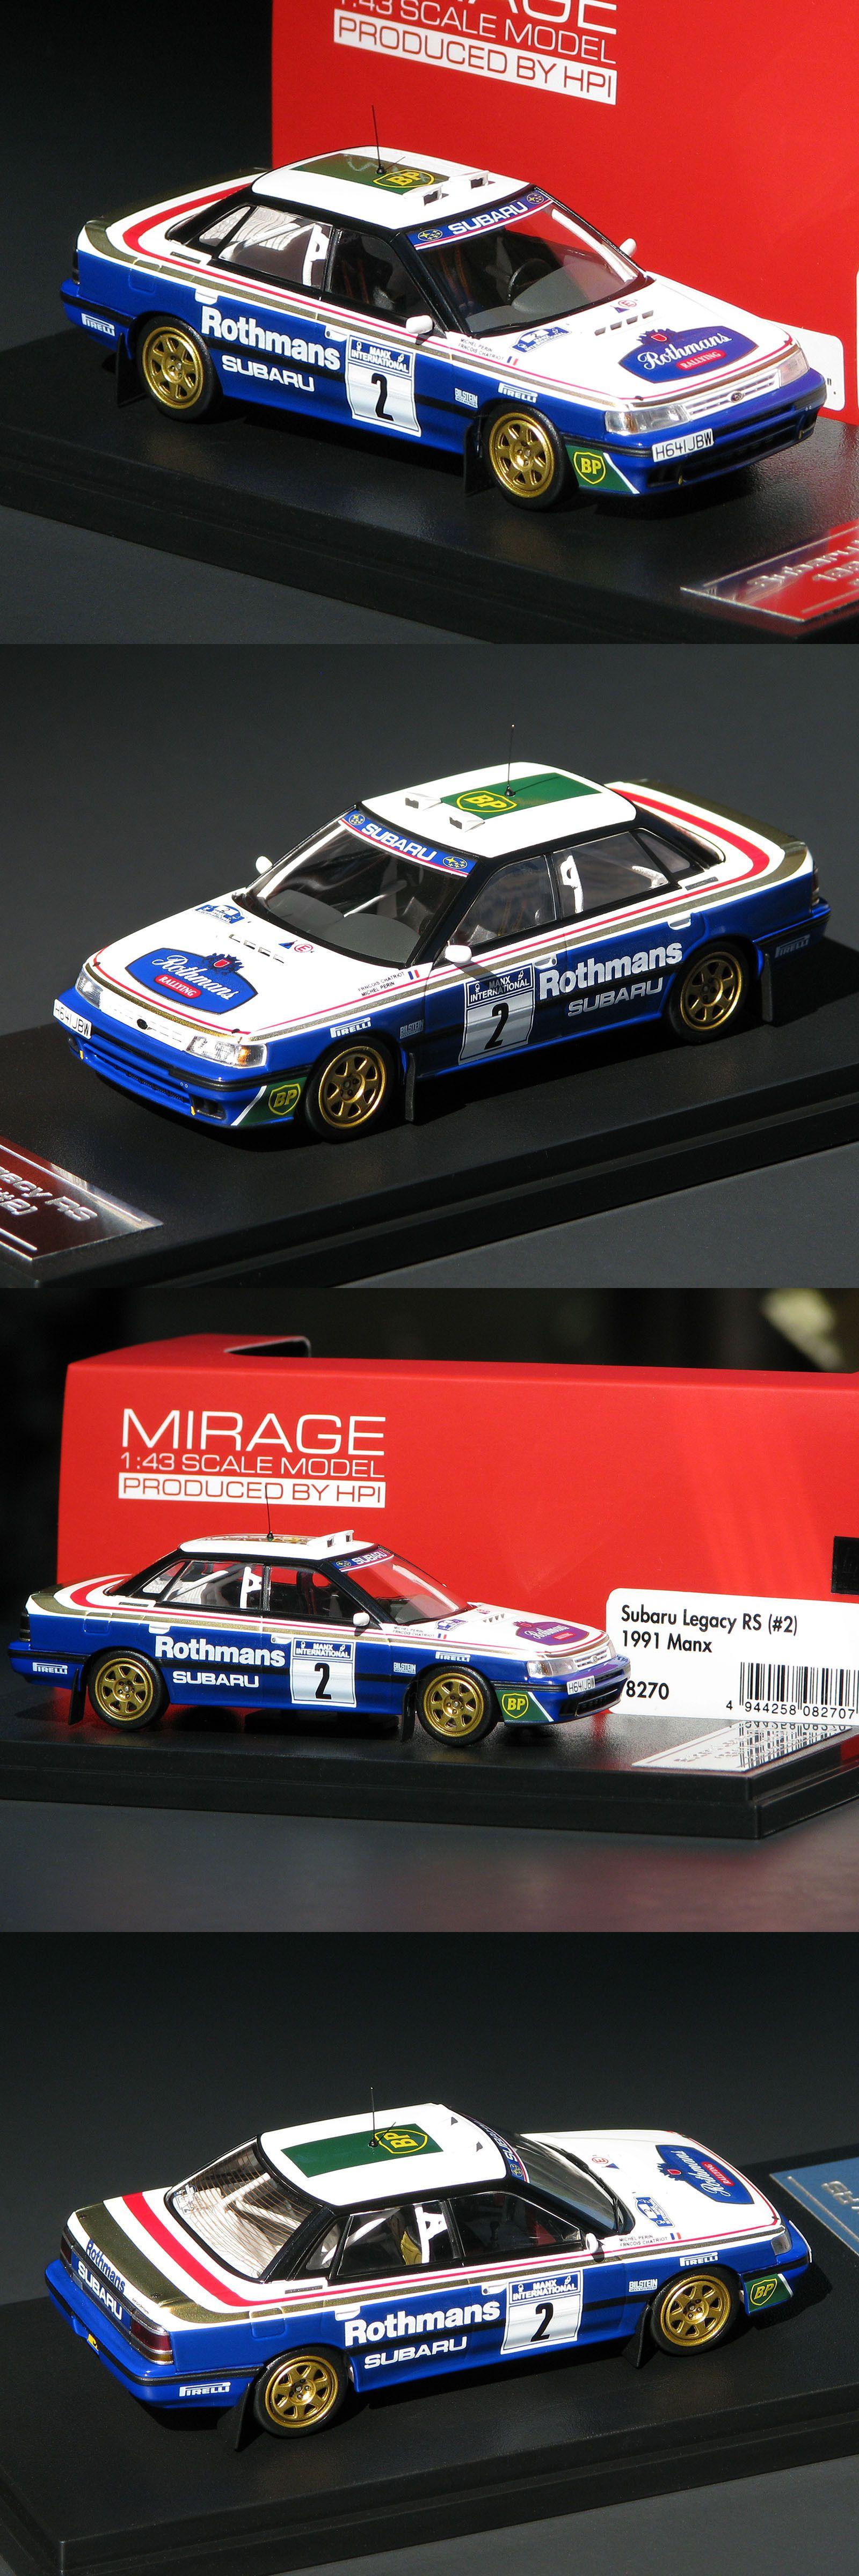 Rally Cars 180271 Rothmans Logos Applied Subaru Legacy Rs 2 1991